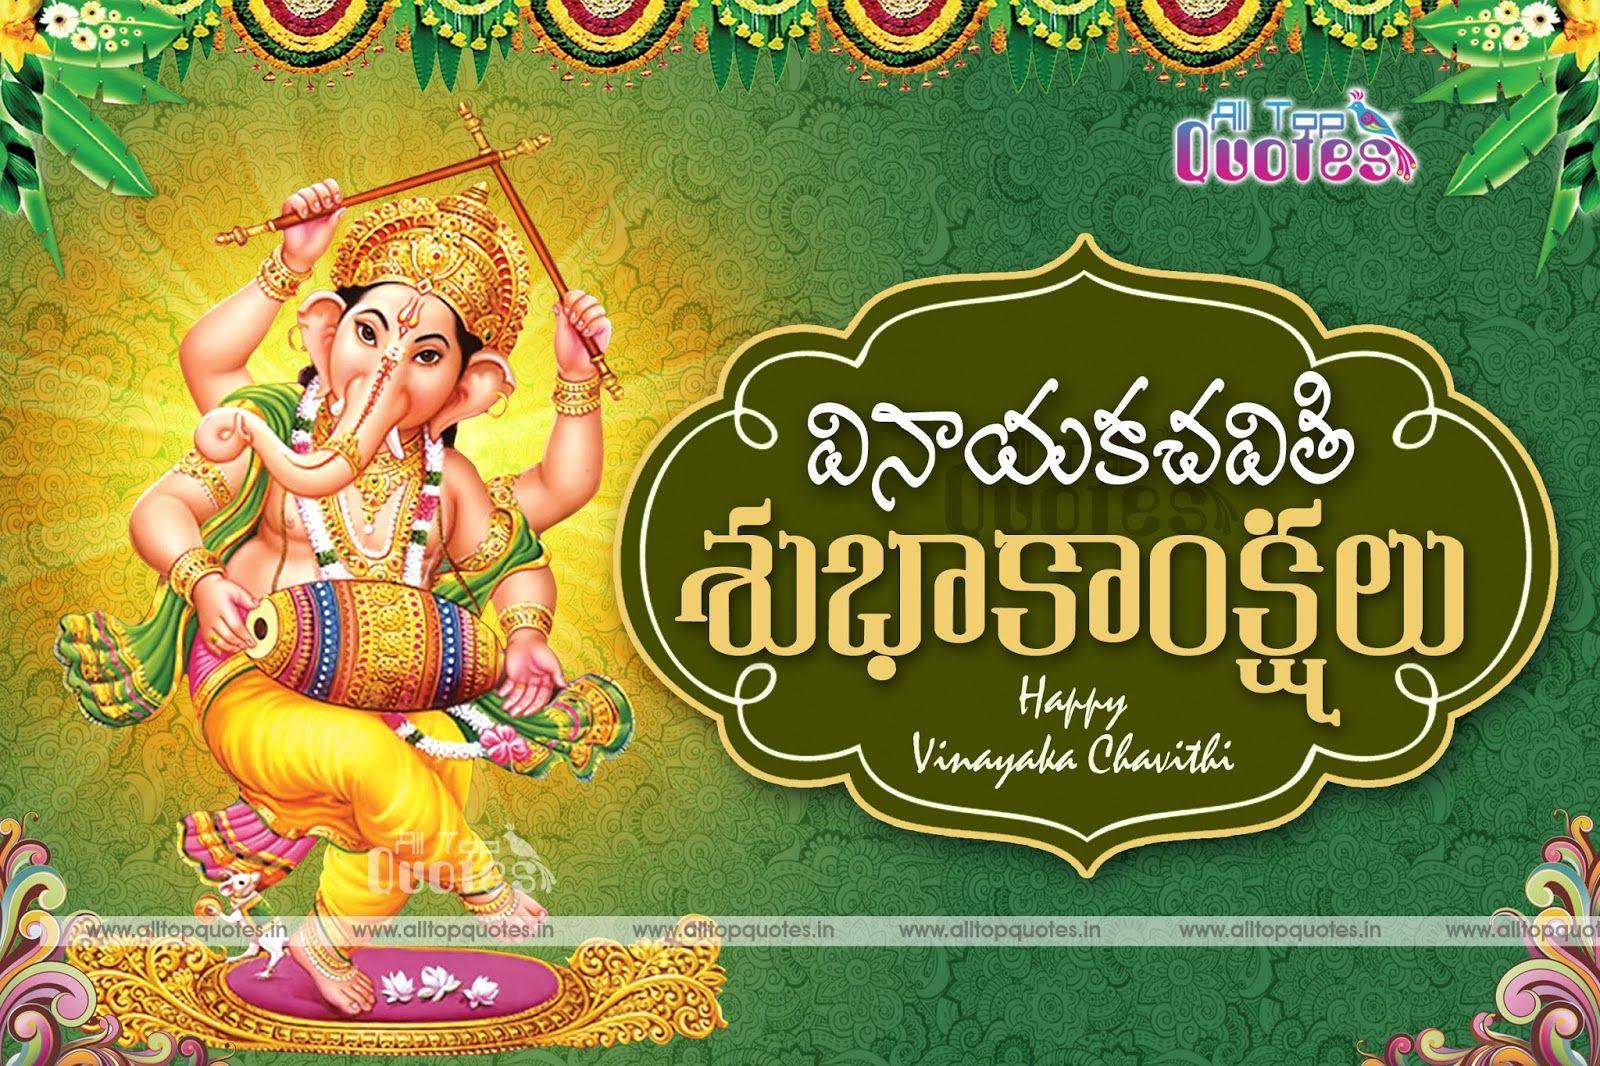 Vinayaka Chavithi Nice Telugu Quotes With Lord Ganesha Hd